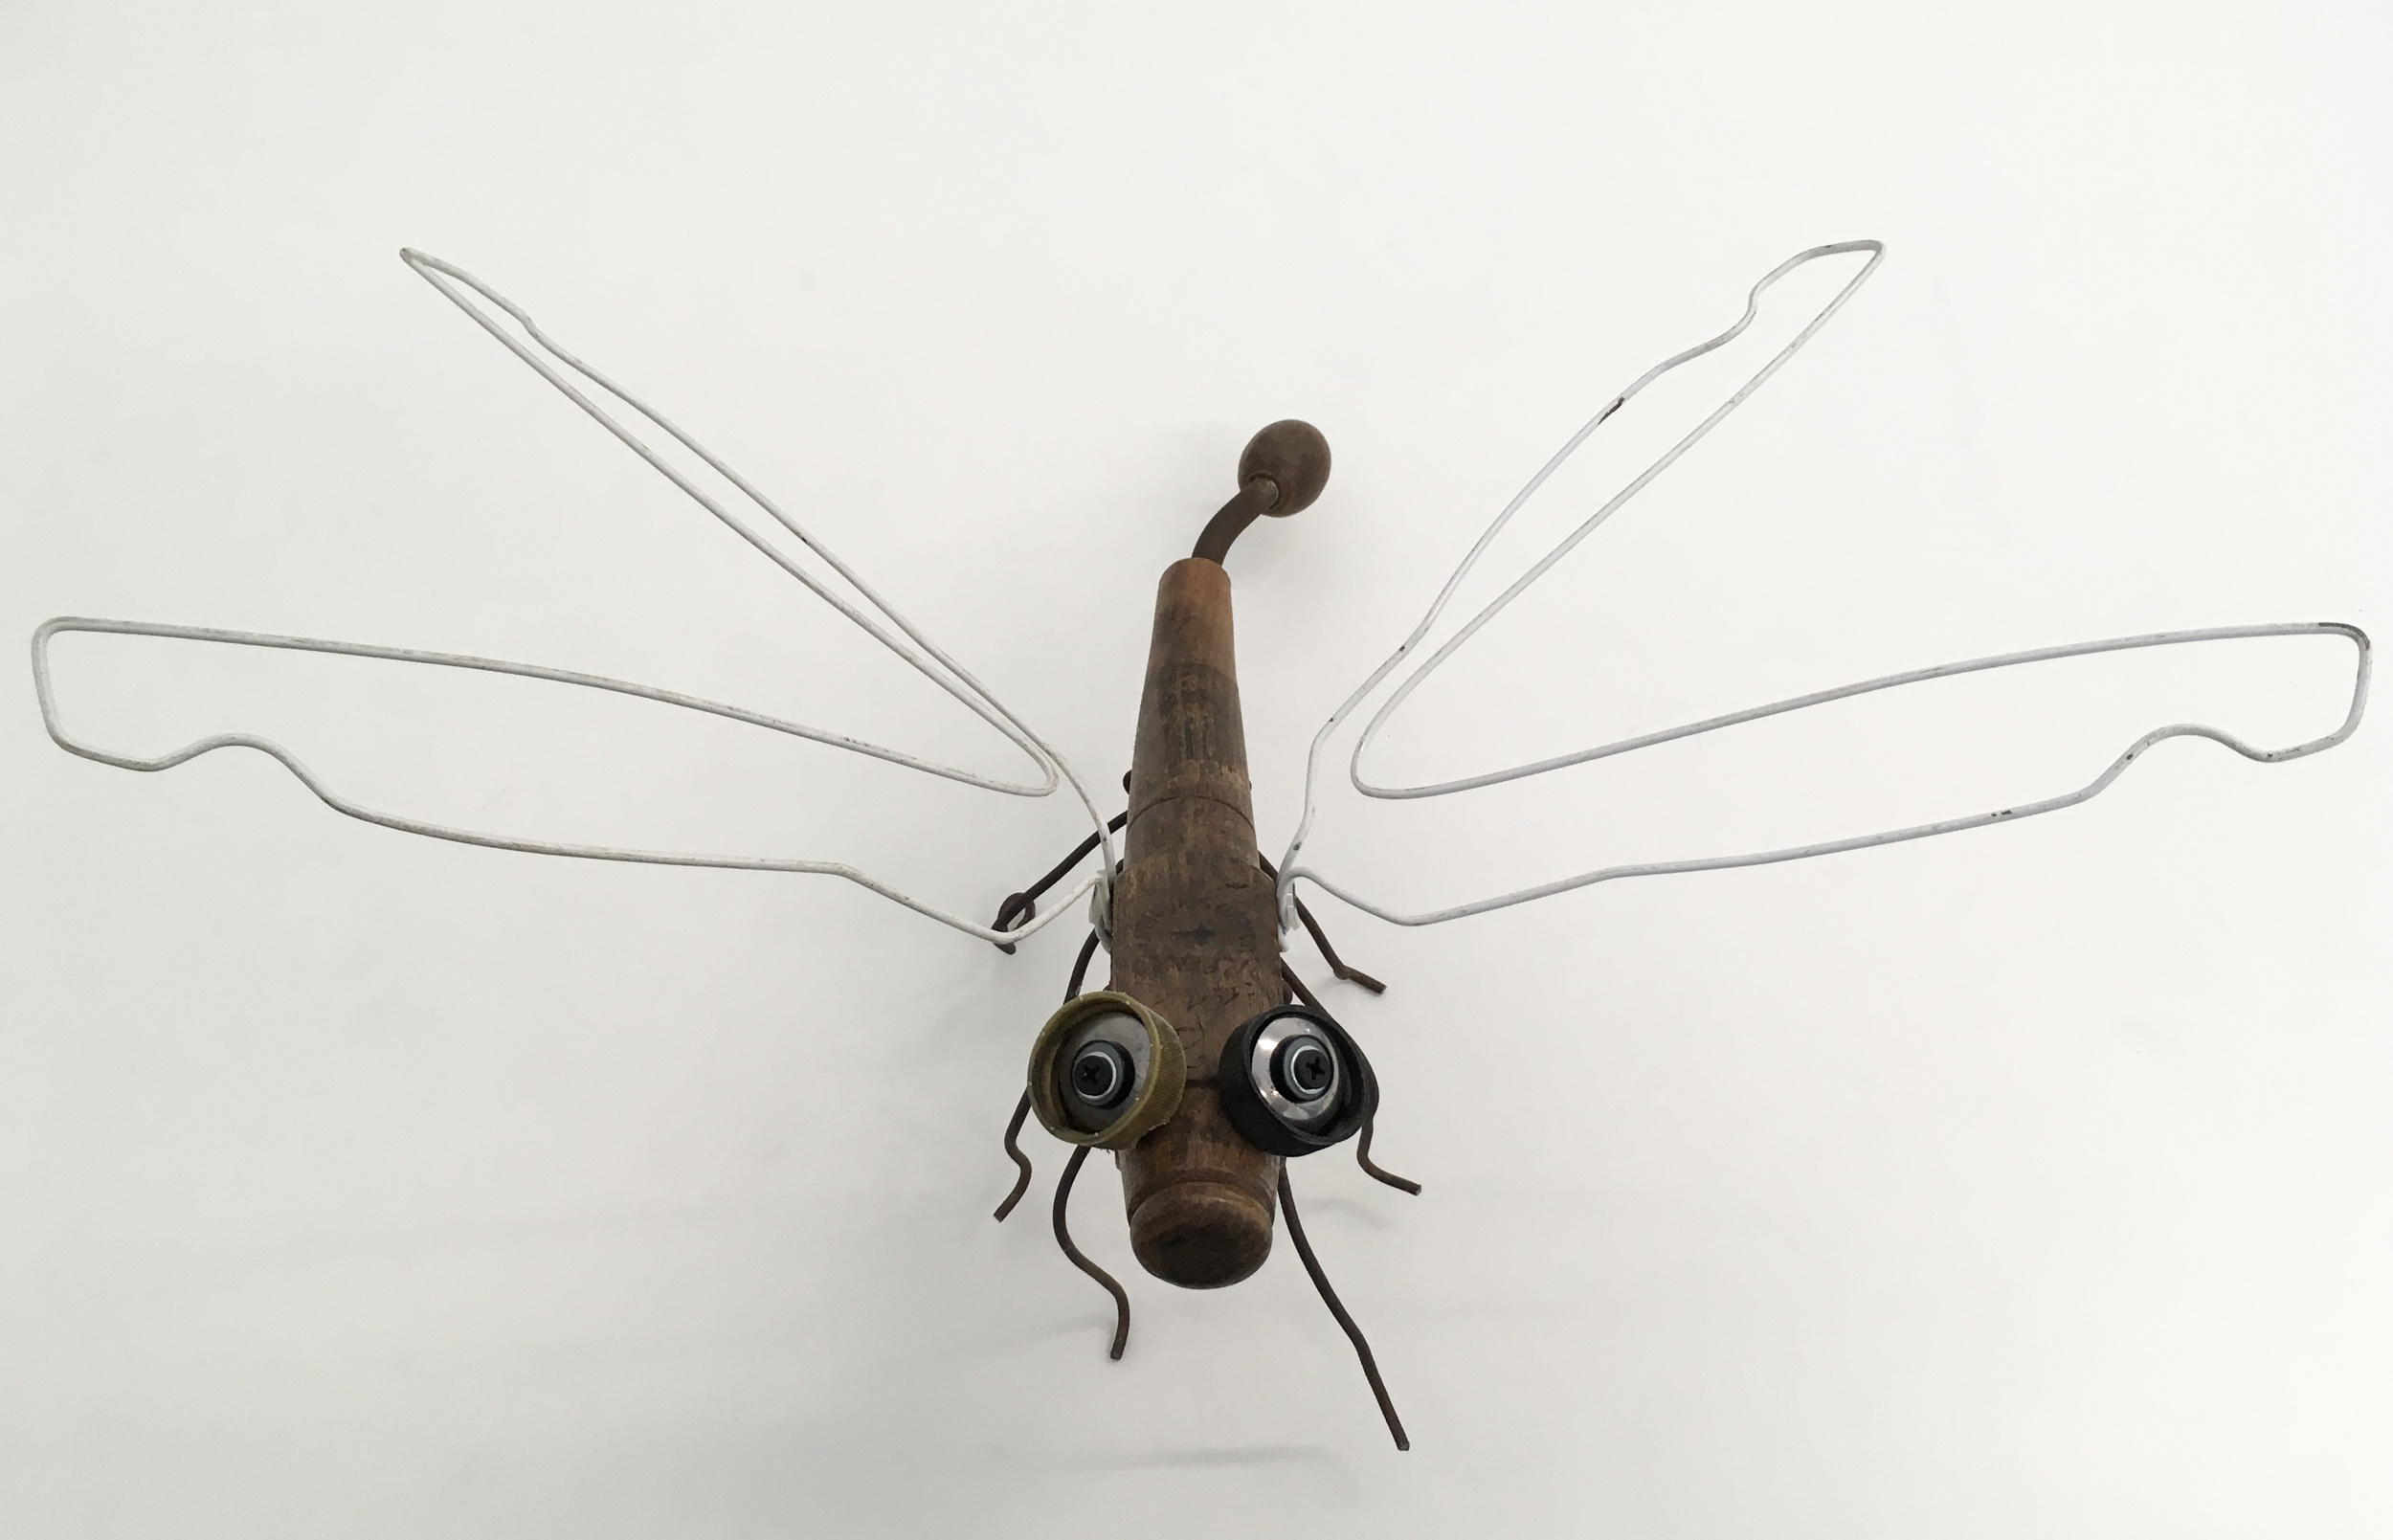 mohr jens - Libelle / Dragonfly